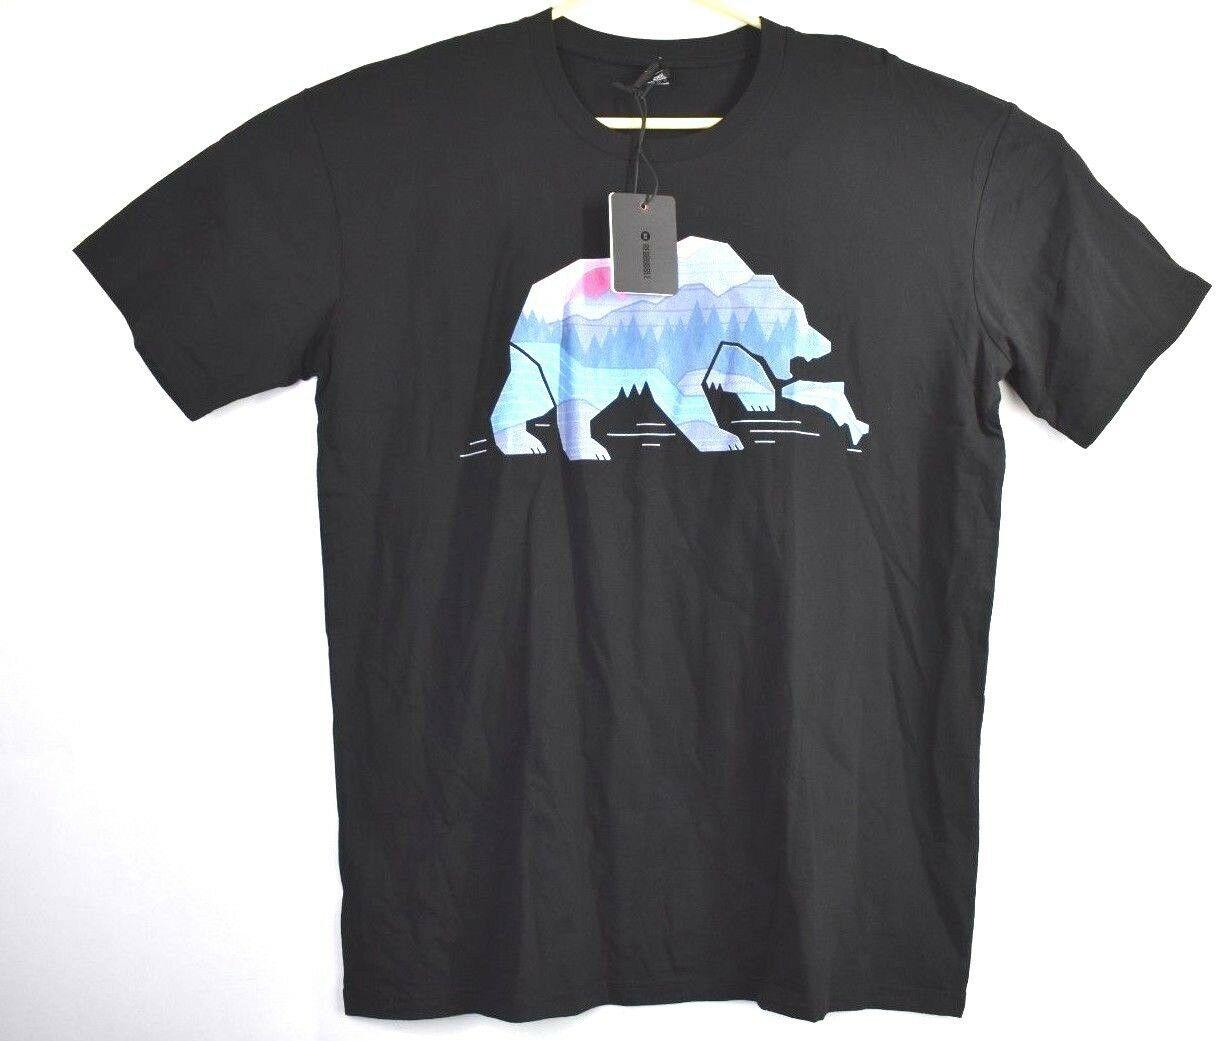 d88d02ec Redbubble Men's XL Black Bear Country By The Paper Crane Short Sleeve T  Shirt Men Women Unisex Fashion tshirt Free Shipping